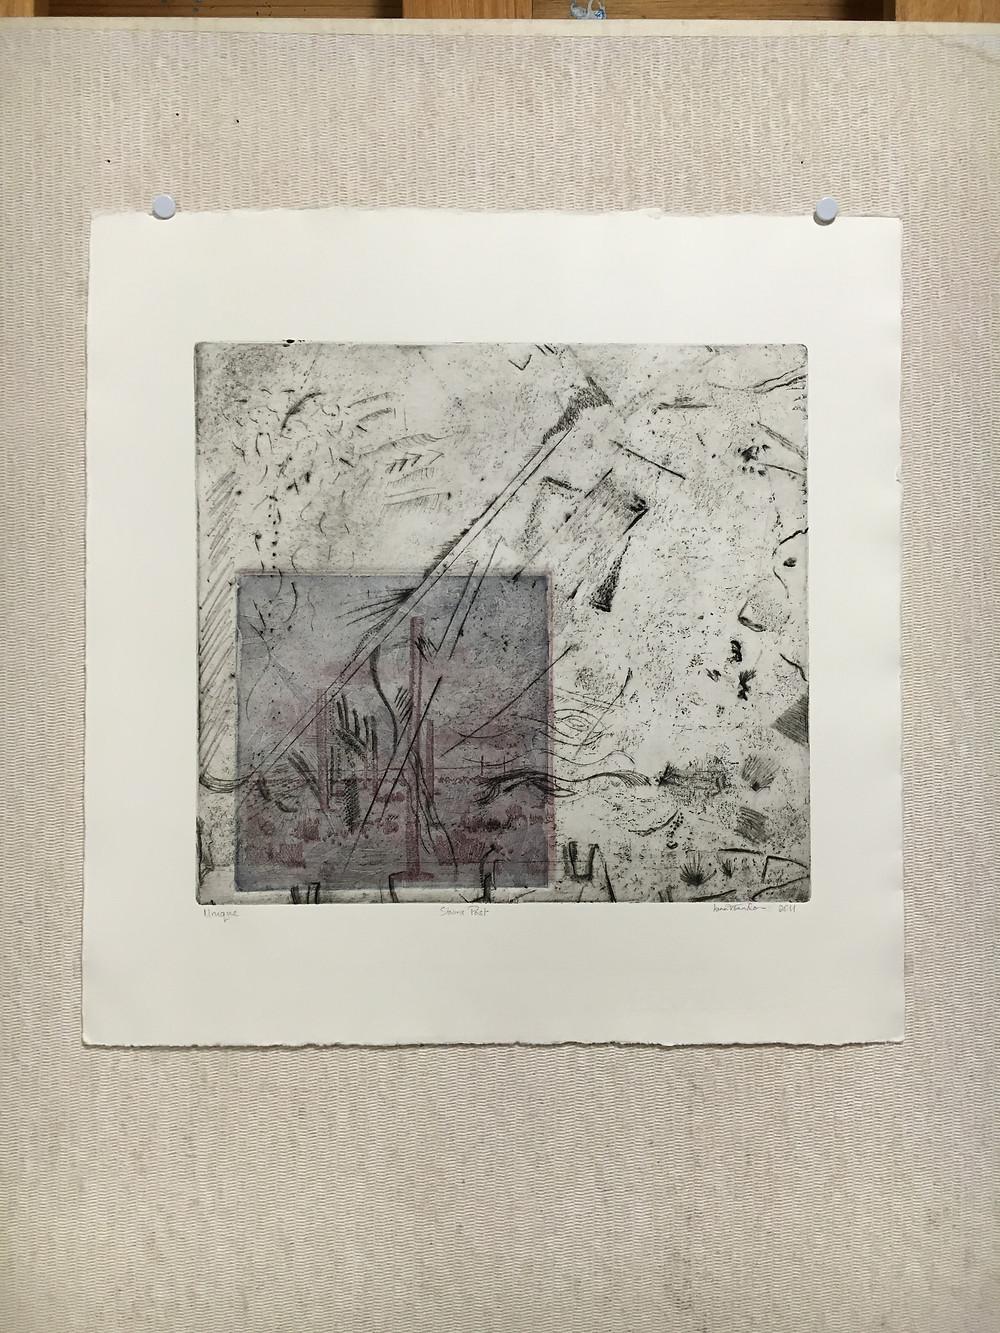 Storms Past, unique, 3 plate intaglio print.